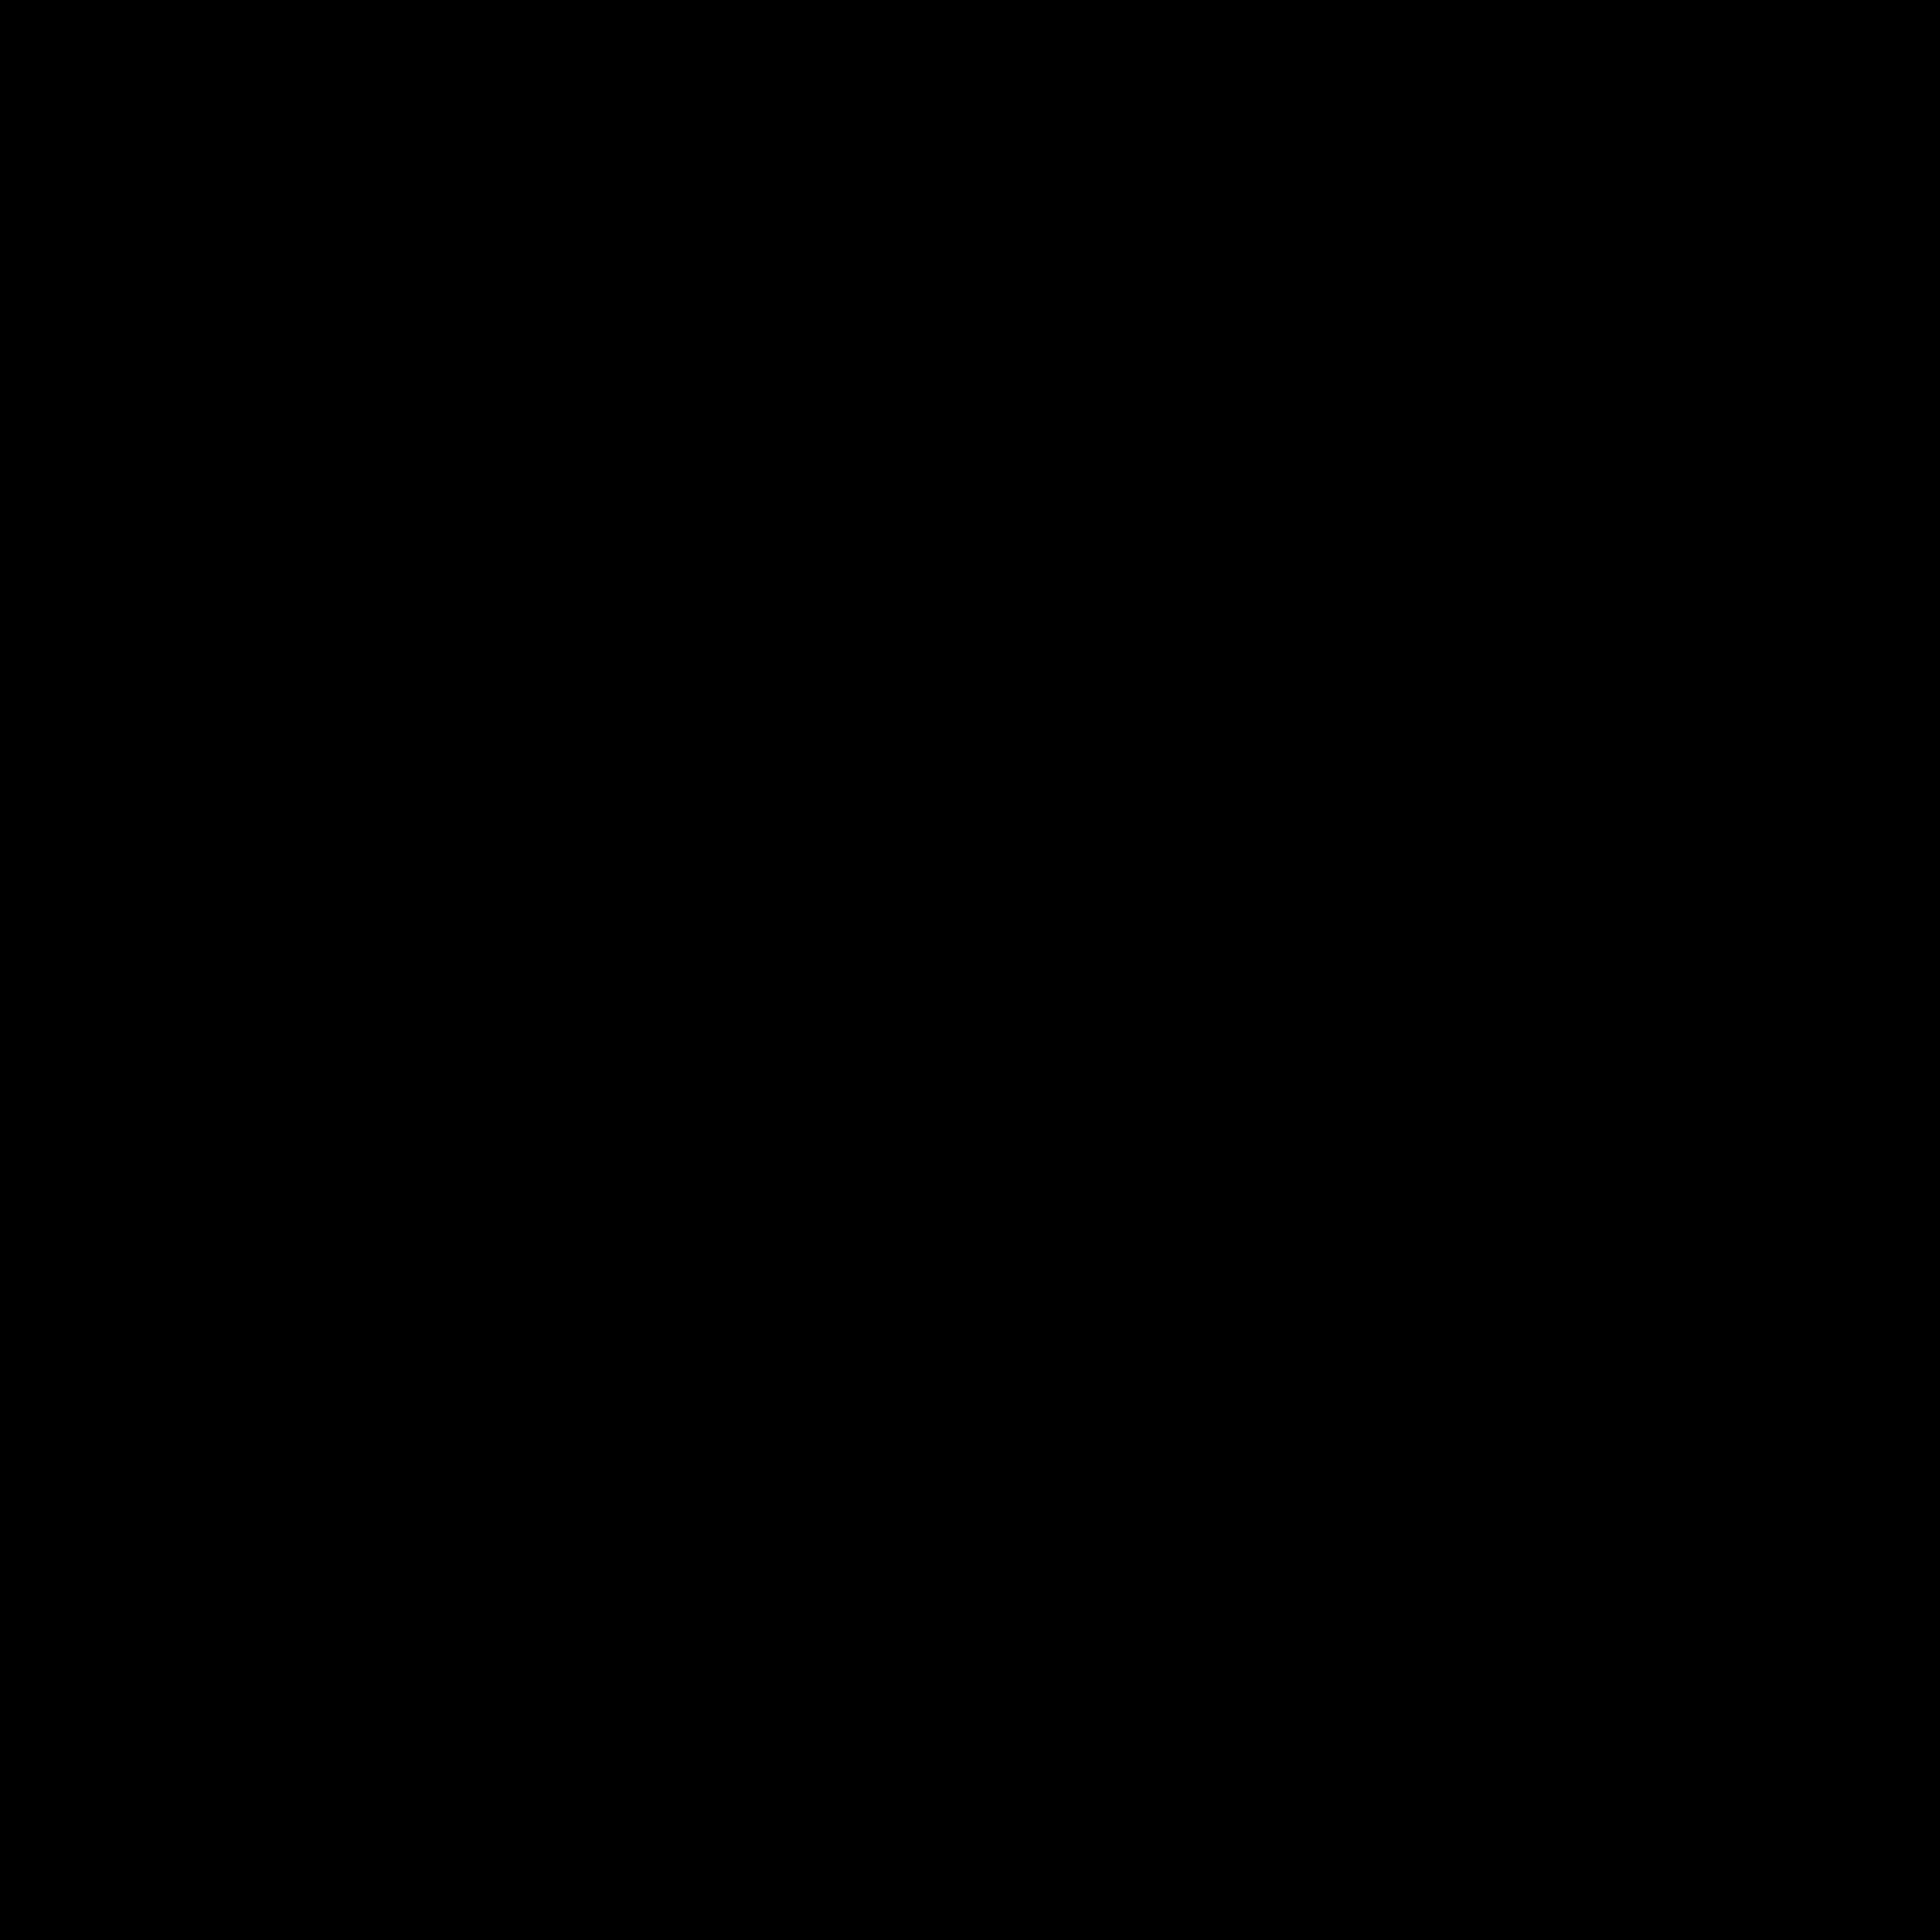 2294x2294 Clipart